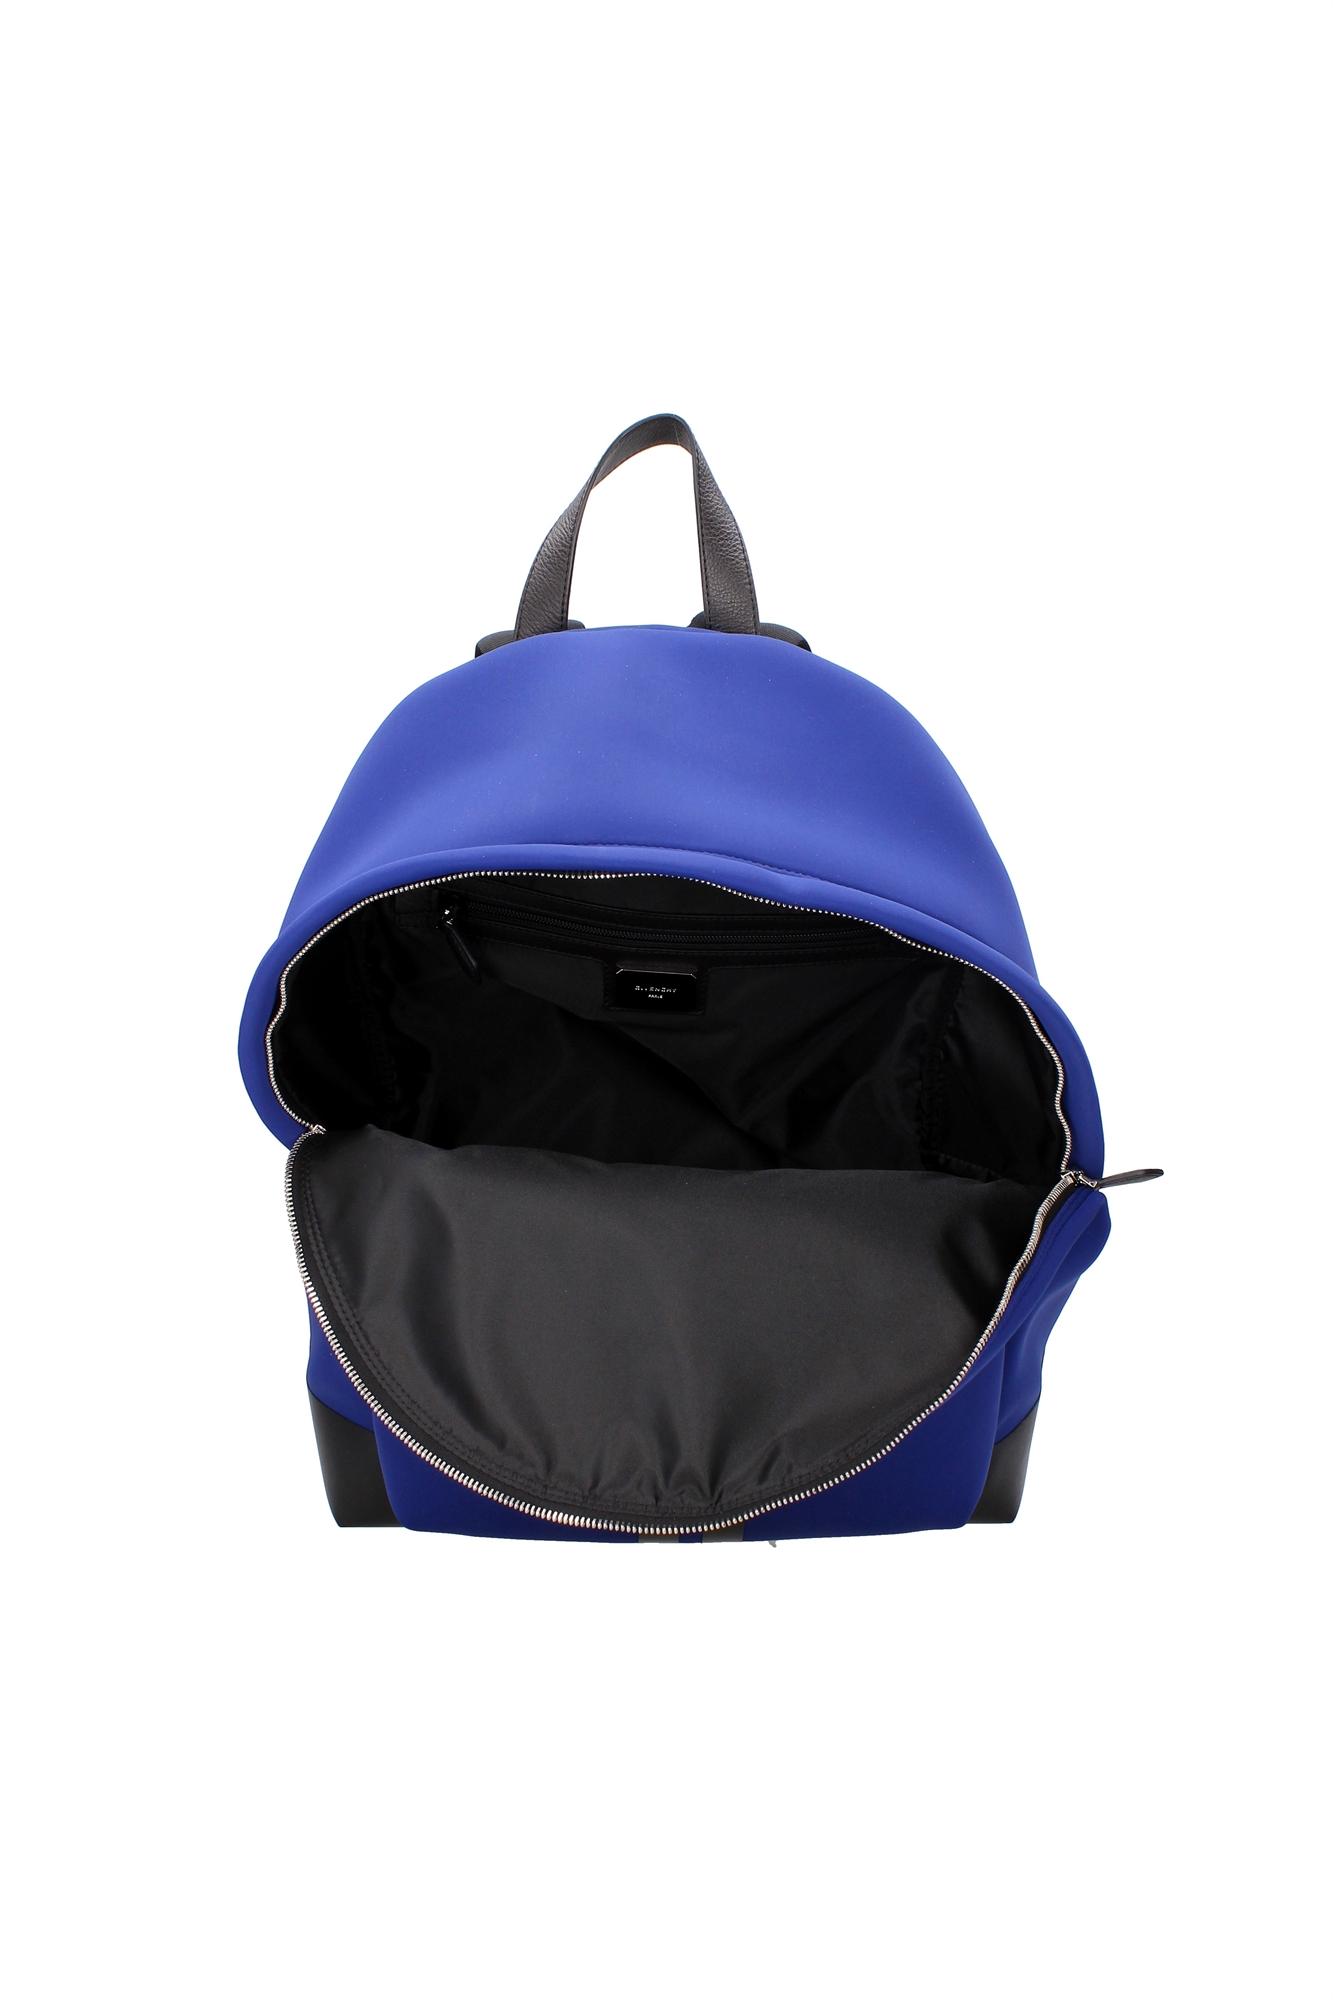 tasche rucksack givenchy herren stoff blau bj05761422400 ebay. Black Bedroom Furniture Sets. Home Design Ideas